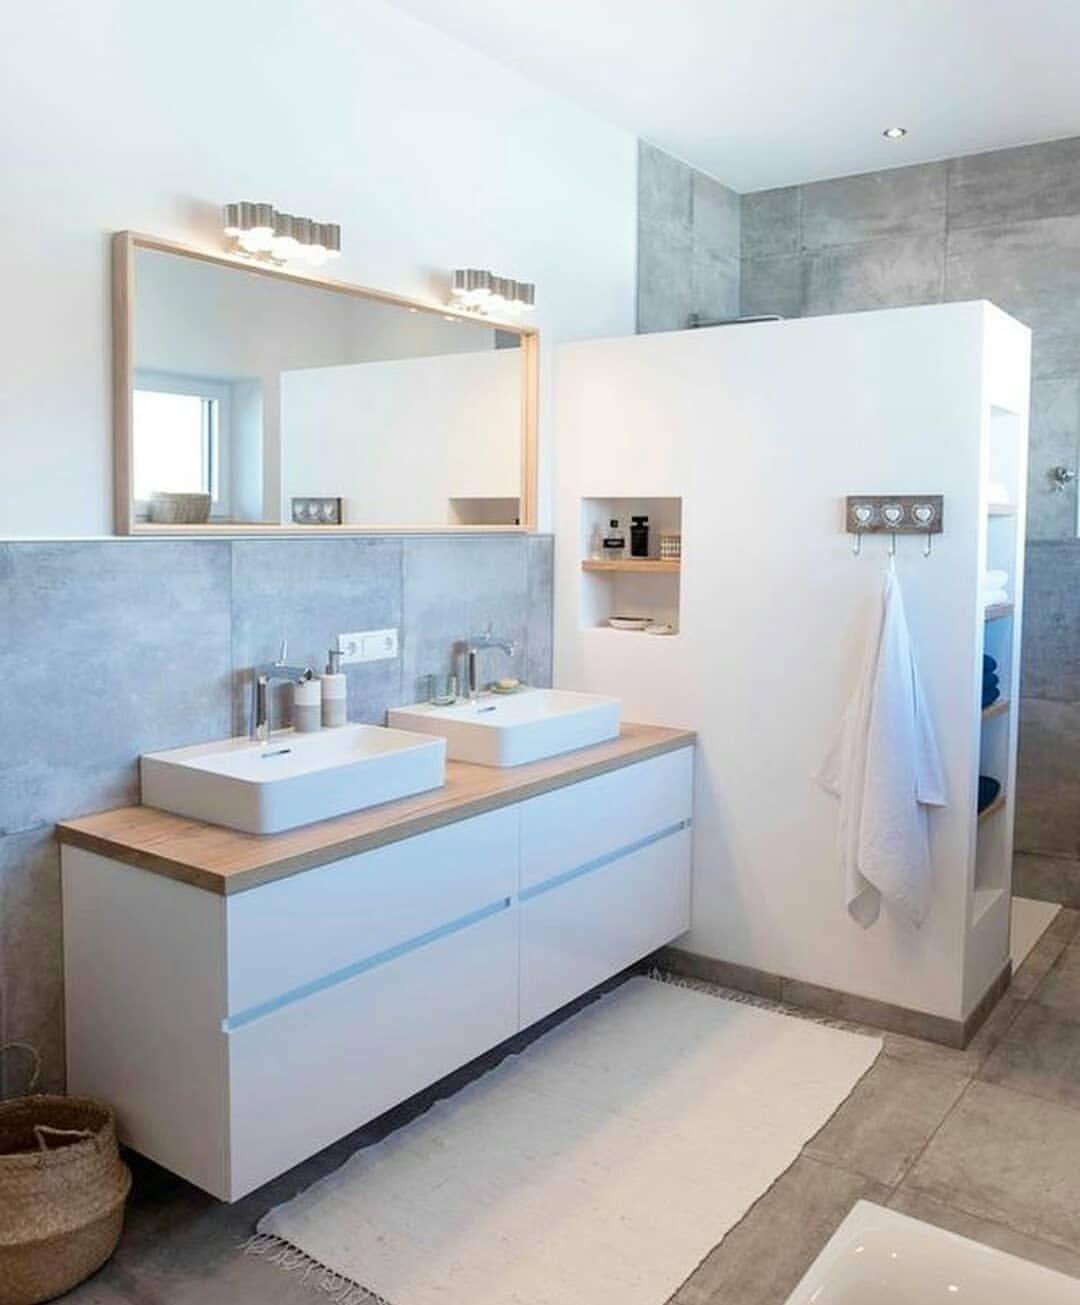 2 484 Gostos 9 Comentarios Home Design Home Design68 No Instagram Credit Inspi Deco Bath Arredo Bagno Moderno Arredamento Bagno Design Del Bagno